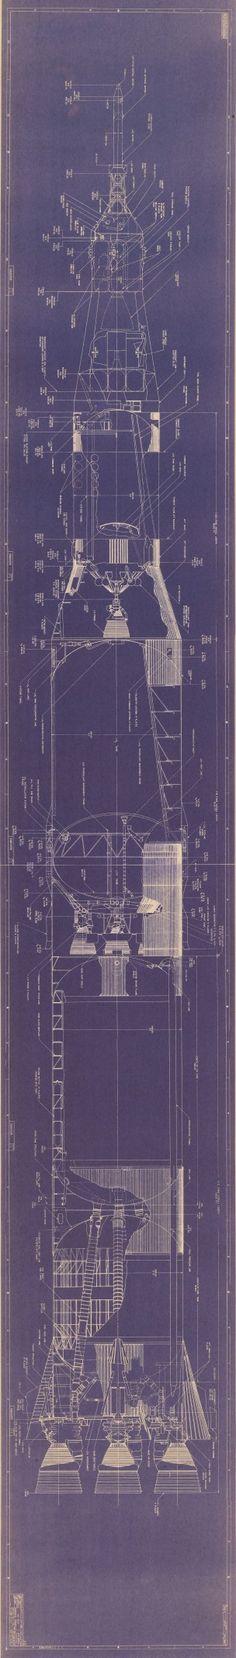 Large Format 06 Saturn V (1/72 scale) $50USD